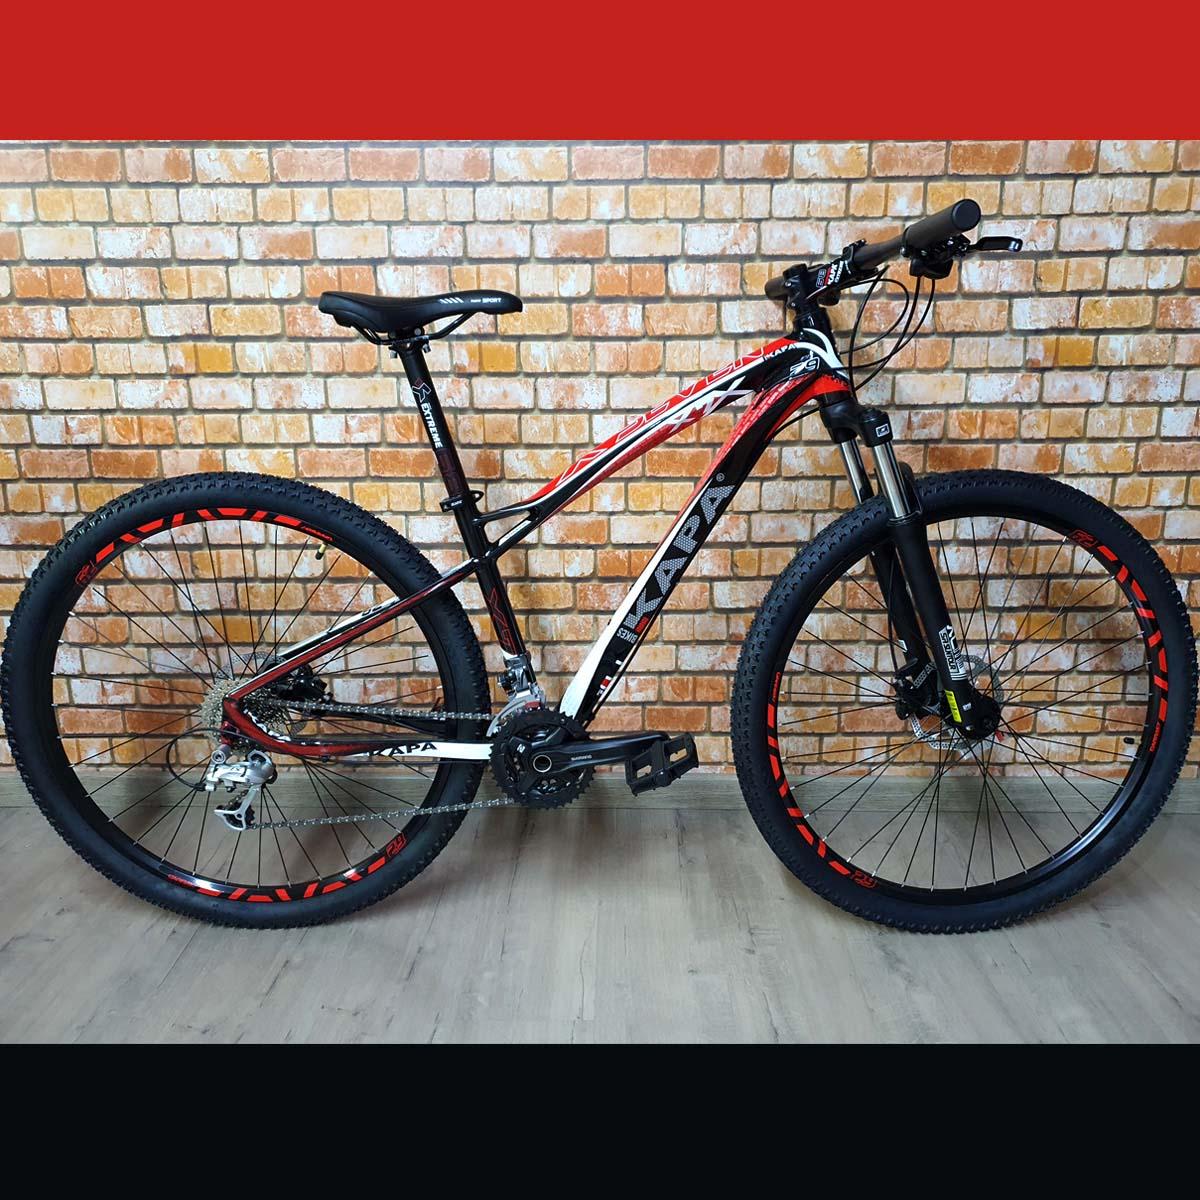 Bicicleta 29 Kapa X7 Shimano Deore 27v Tamanho 16 Preto/verm